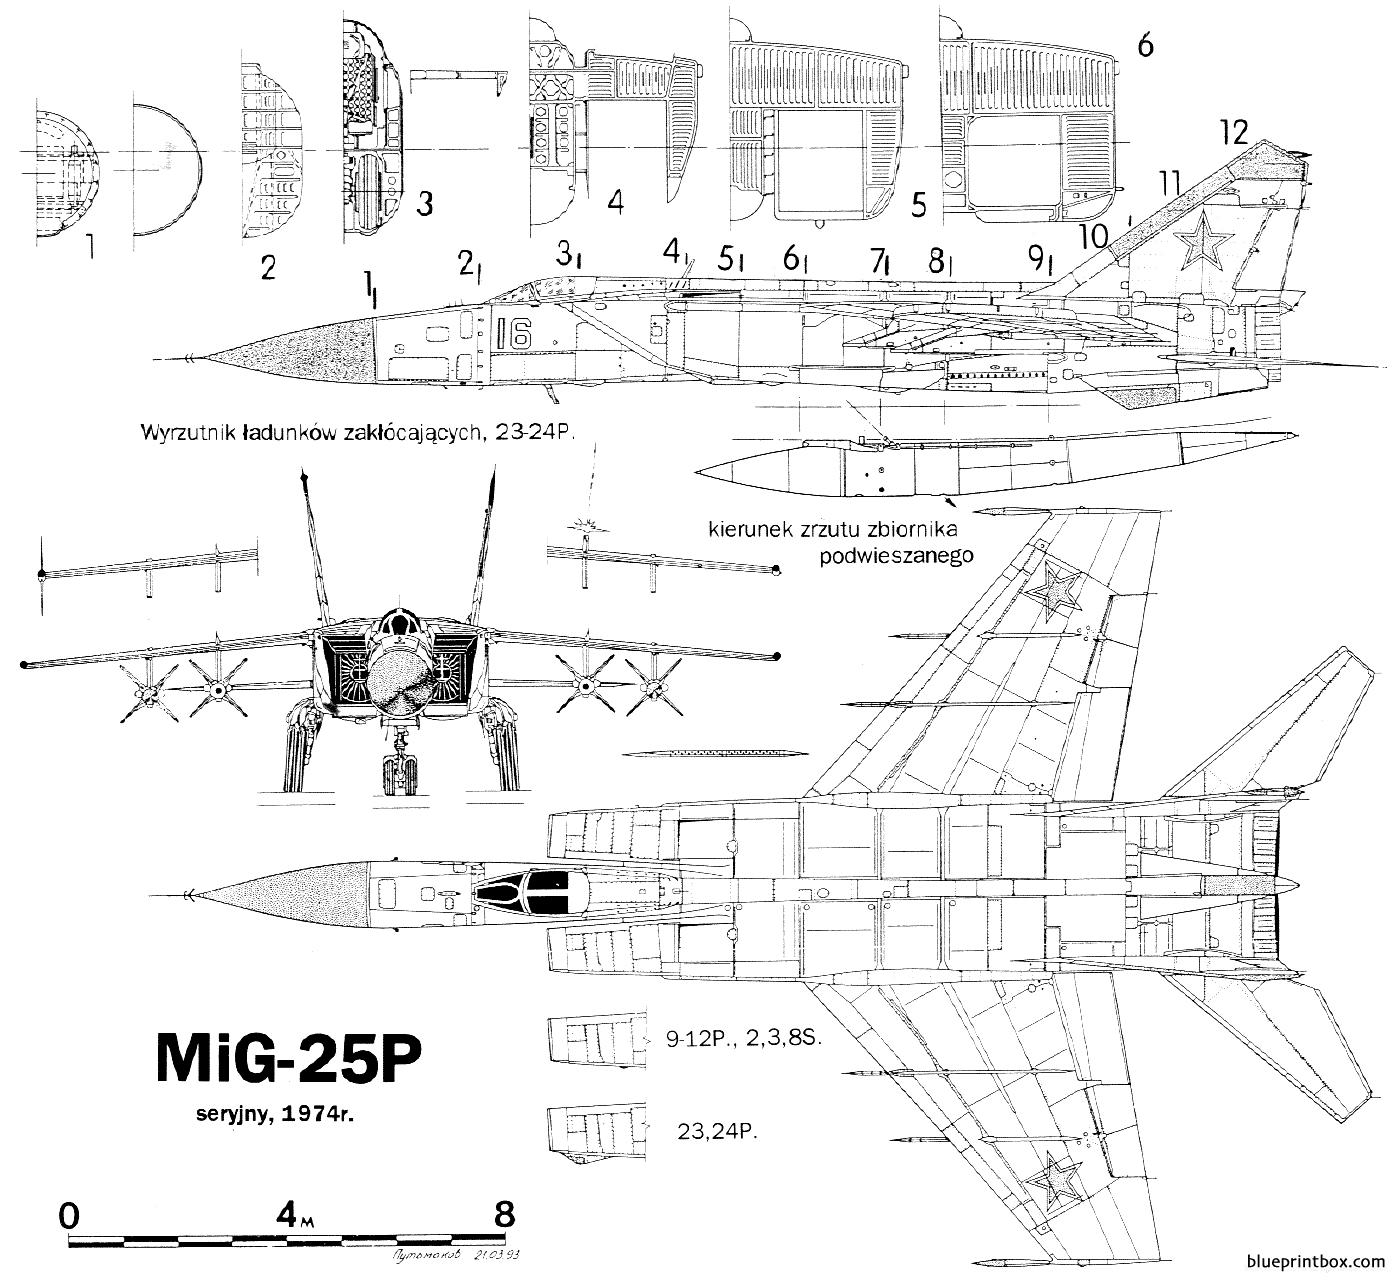 Mikoyan Gurevich Mig 25p 3 - Blueprintbox Com